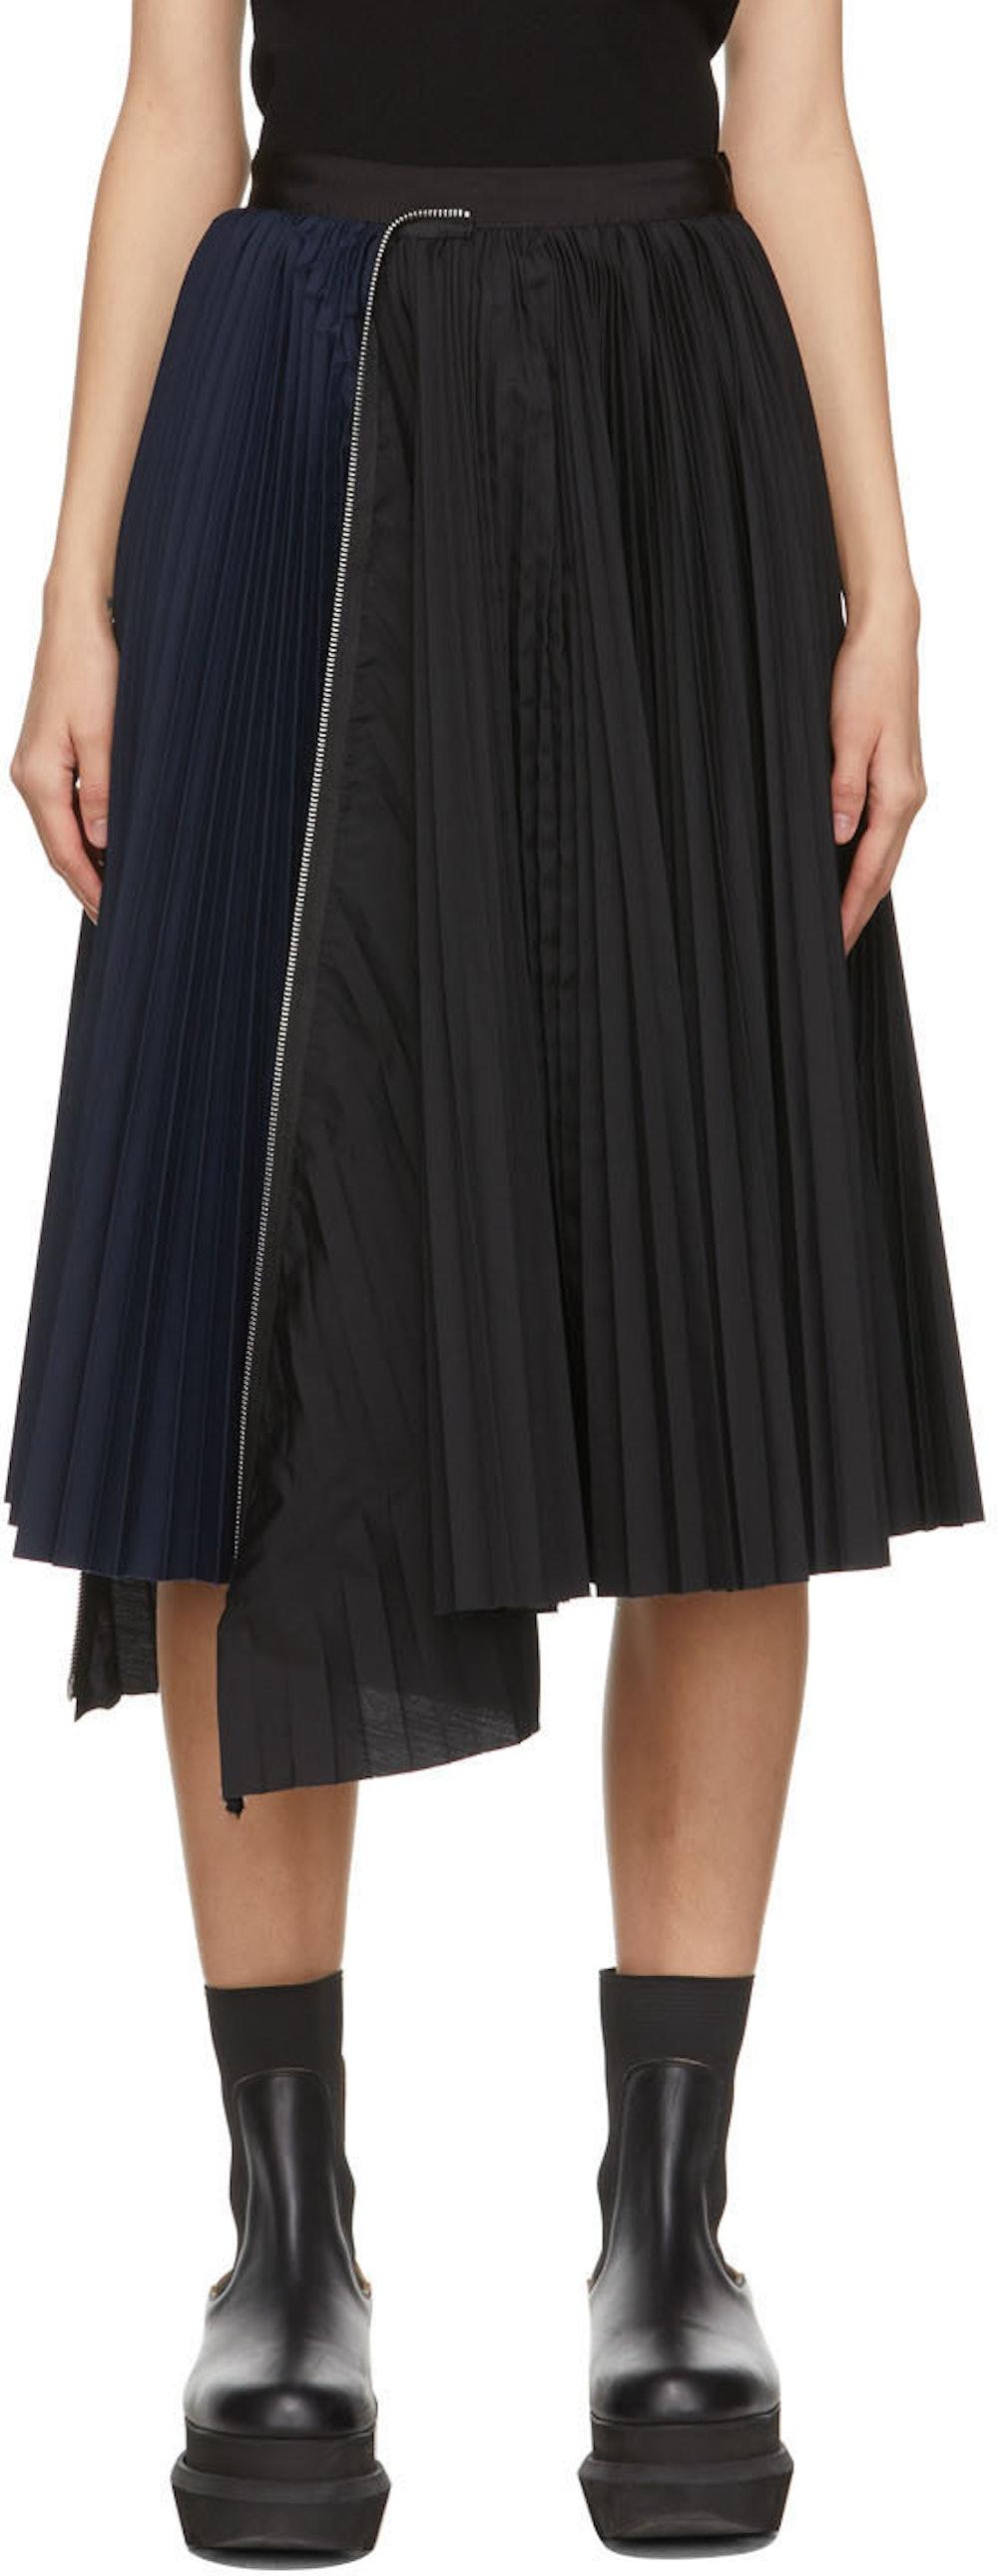 Black & Navy Zip Pleated Skirt